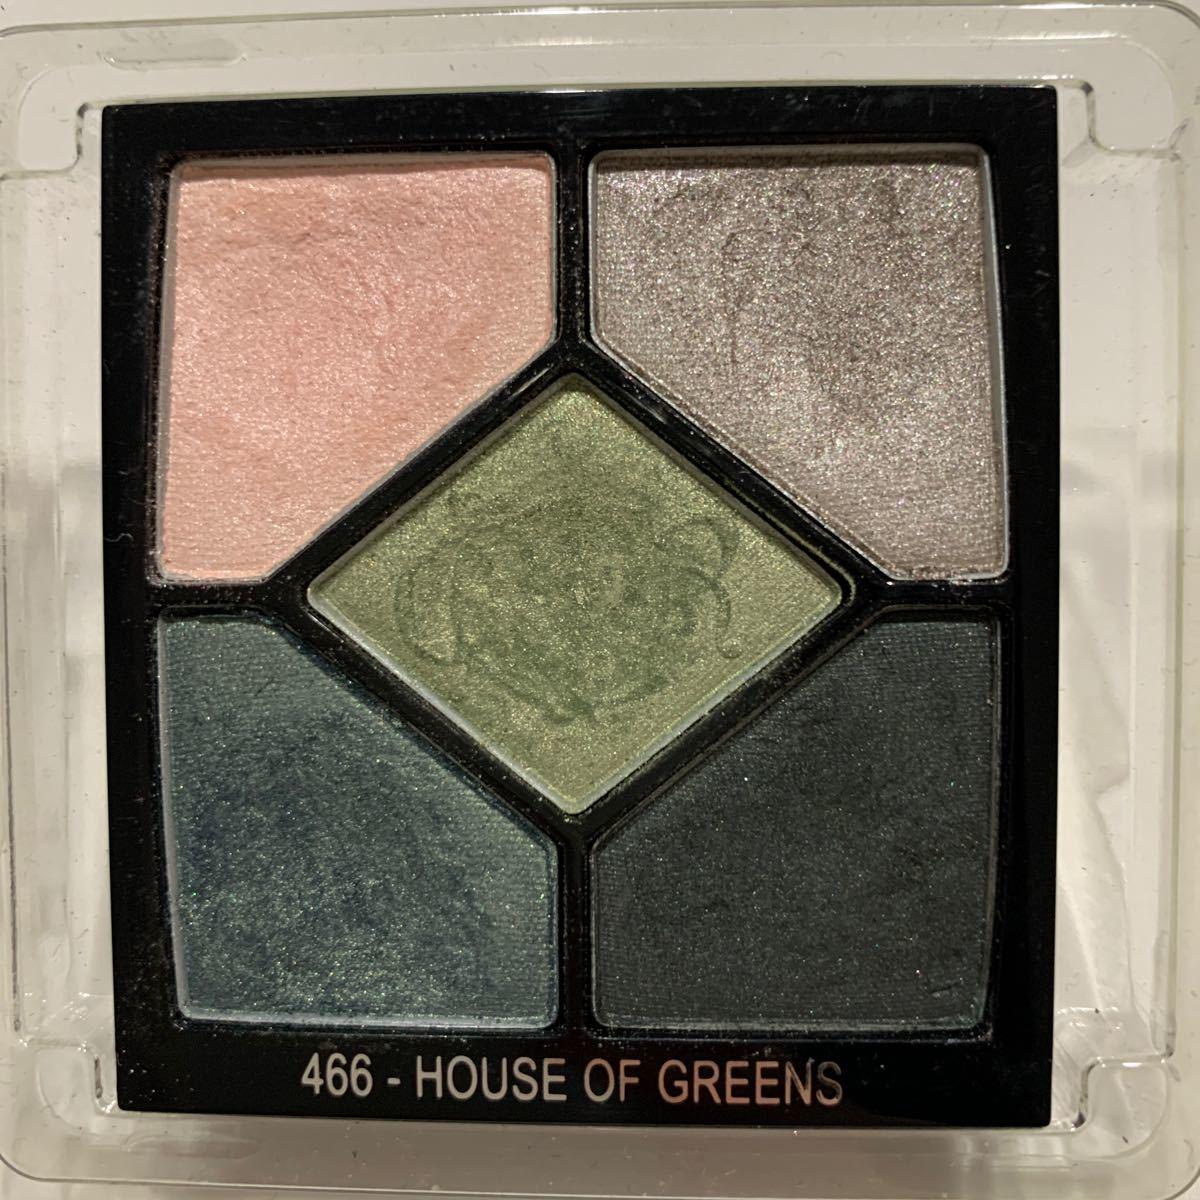 DIOR ディオール  アイシャドウ サンククルール 466 house of greens